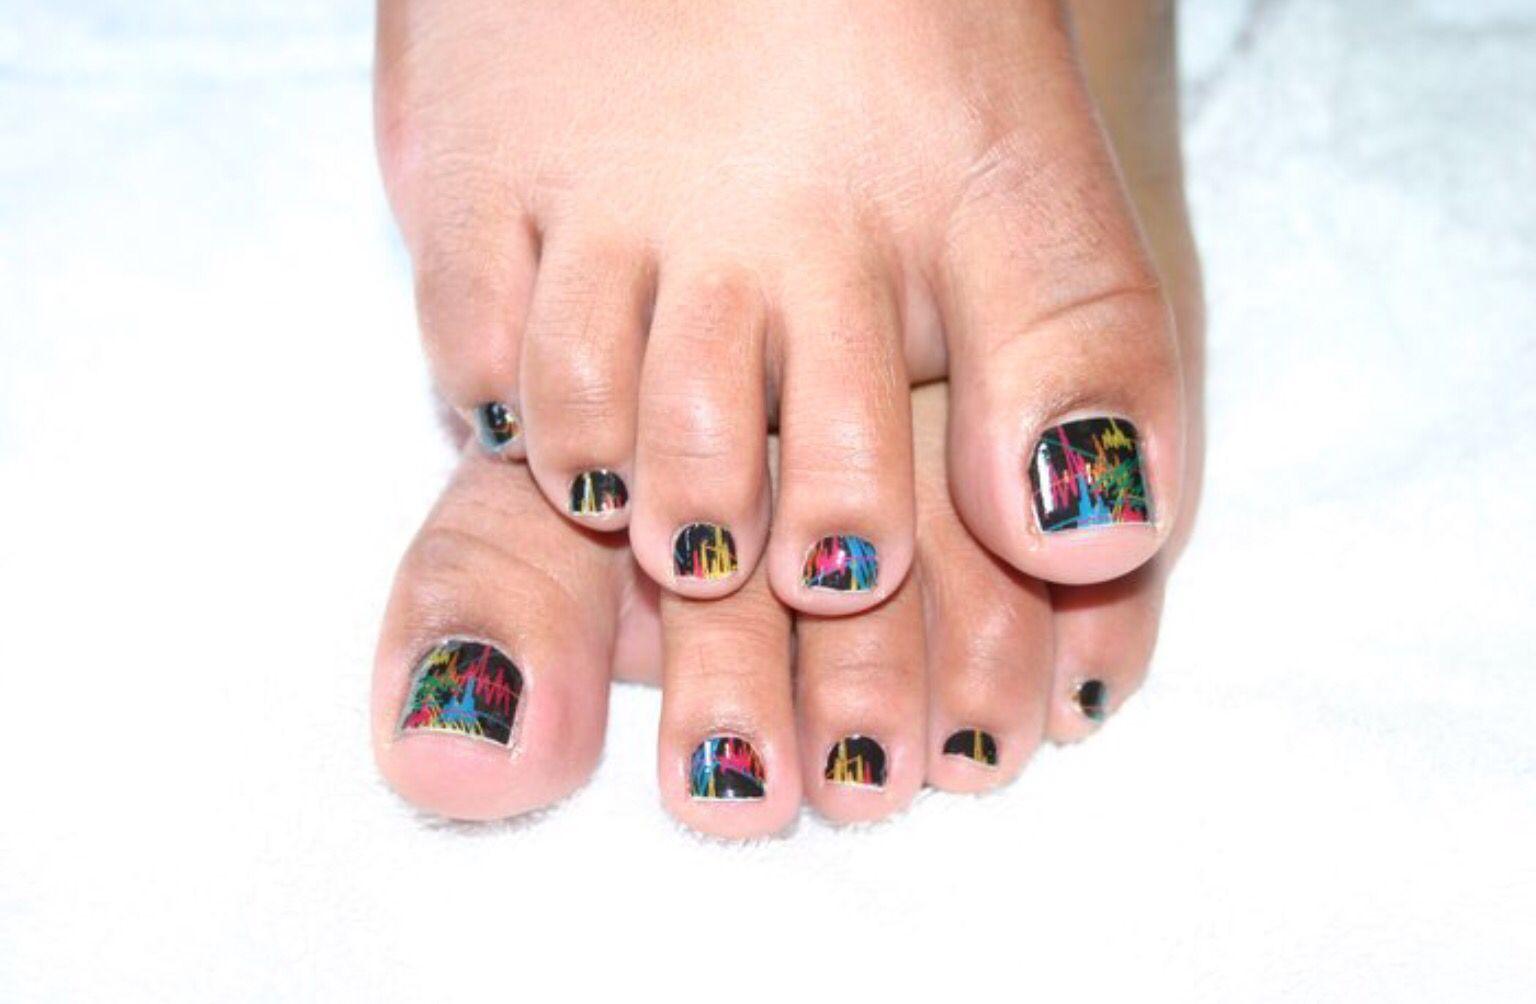 Minx pedicure #cosmospalounge #nailart #handpainted #minx ...